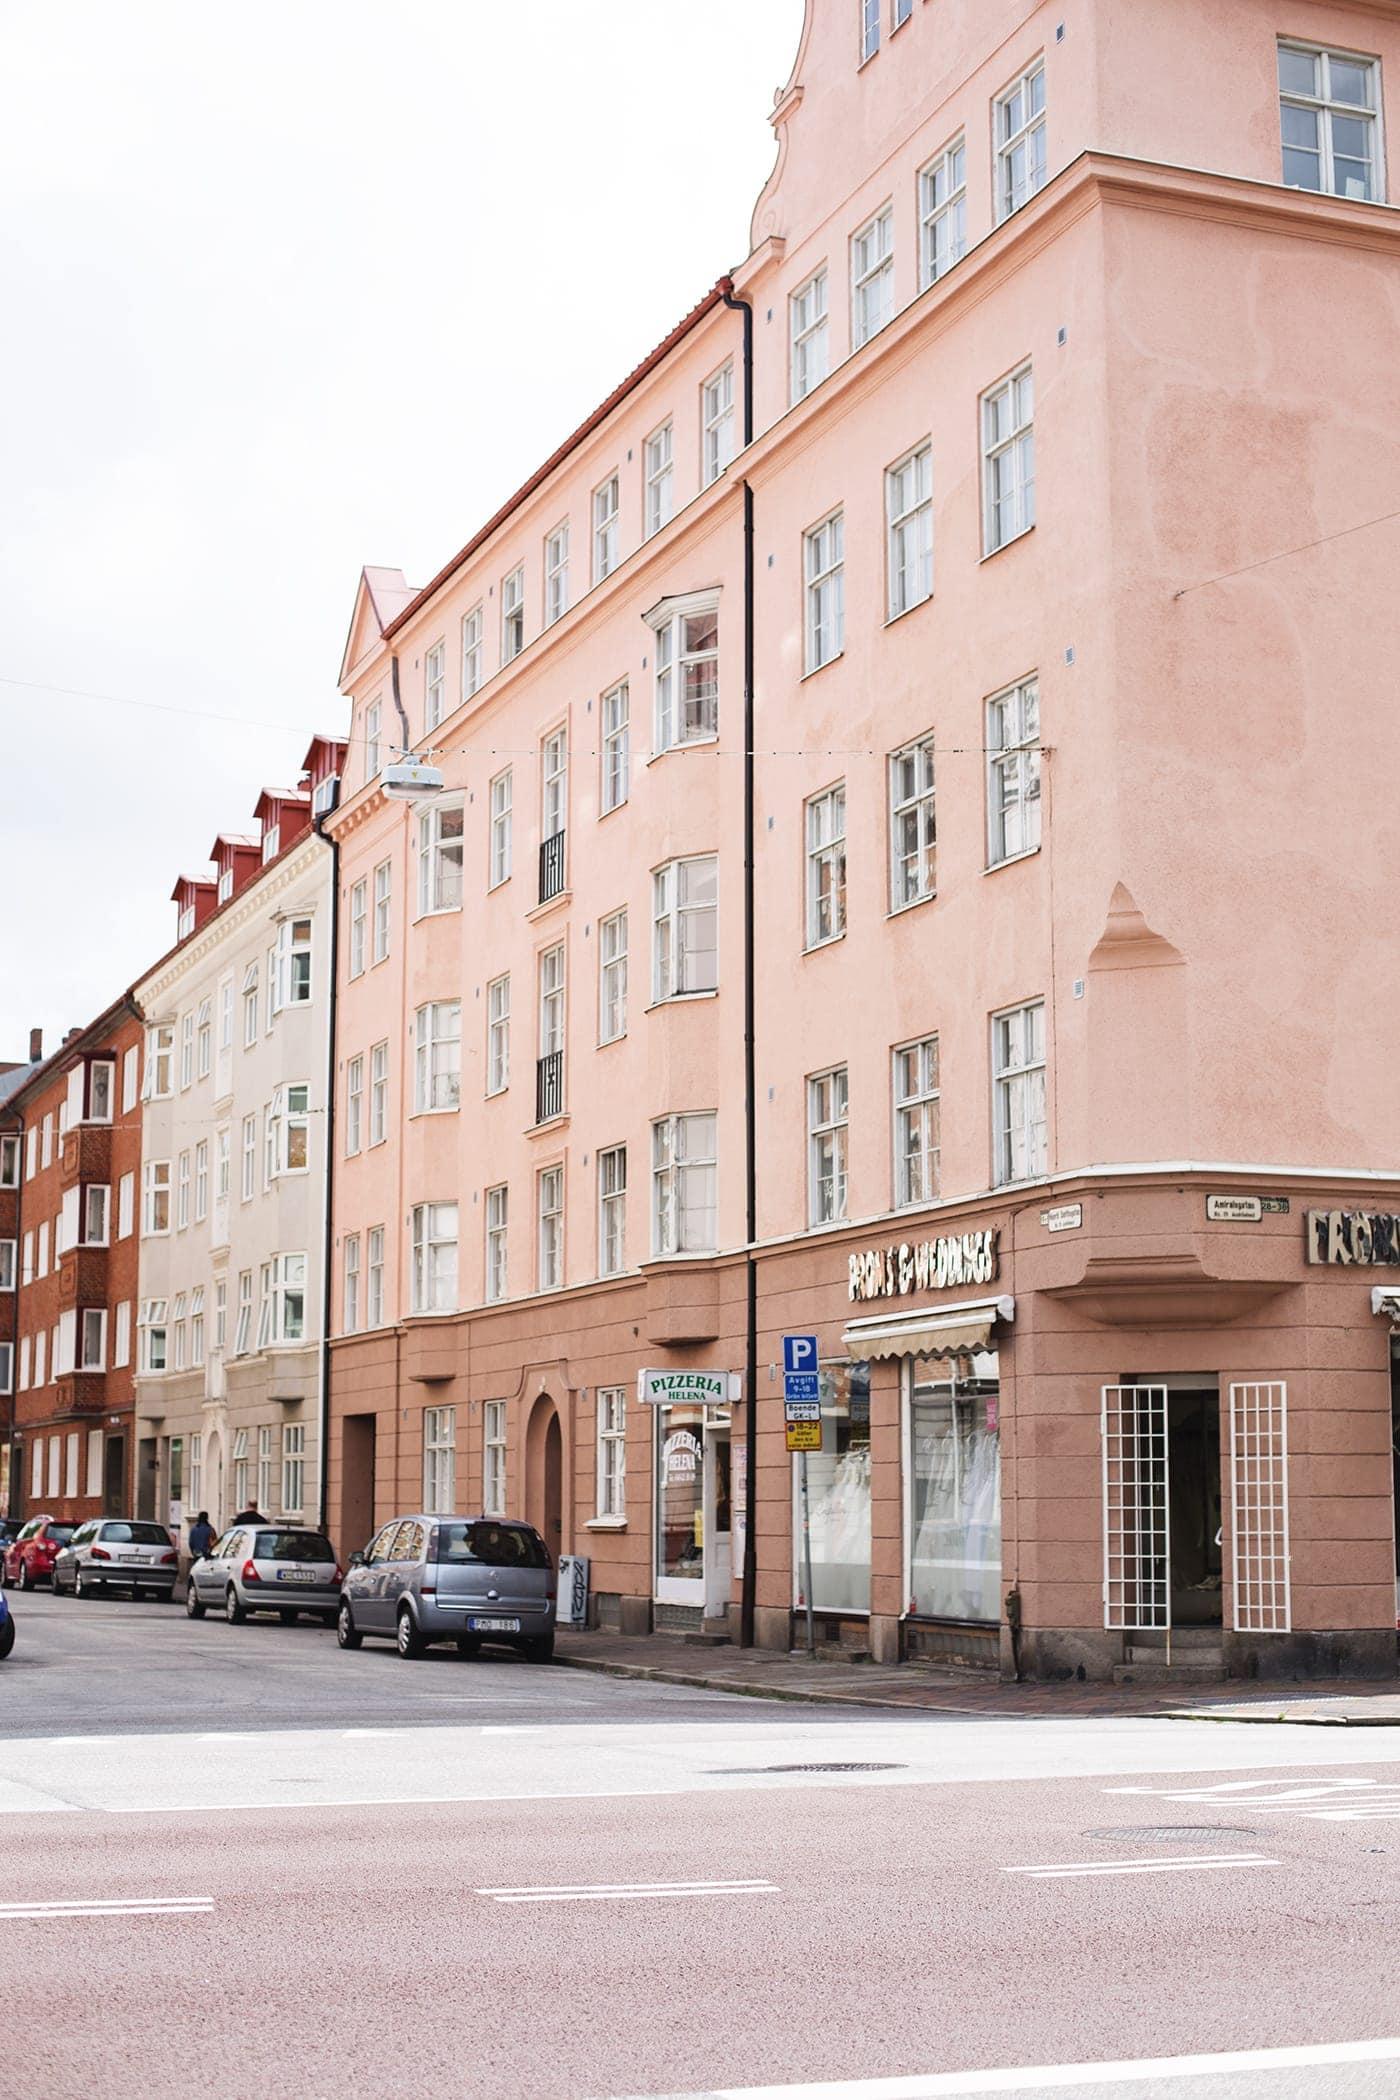 copenhagen-wanderlust-malmo-salmon-coloured-buildings